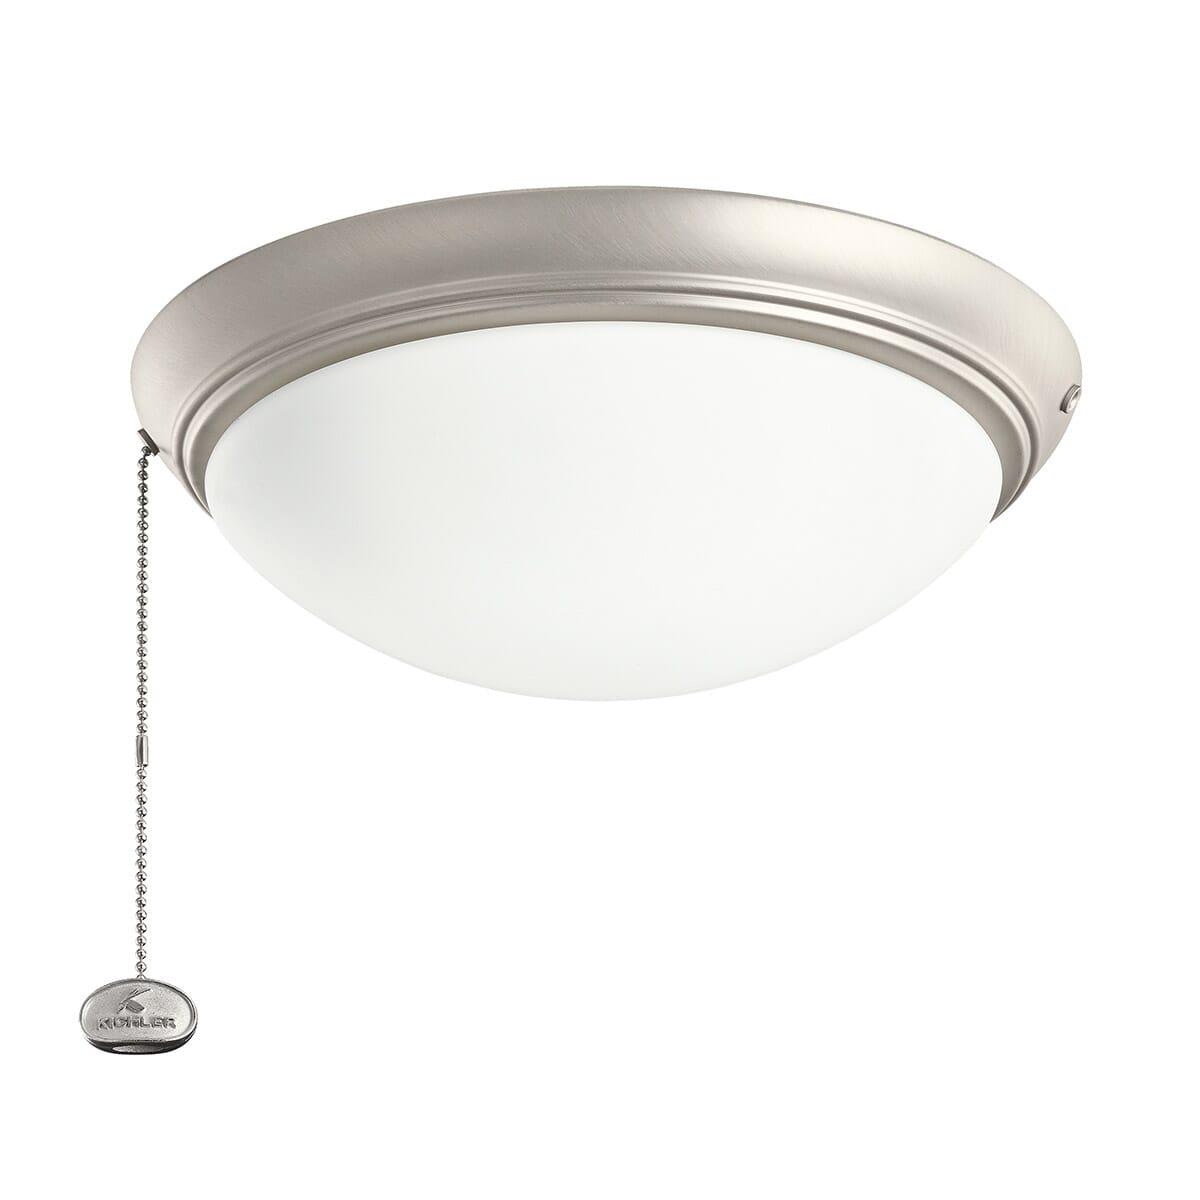 Kichler Accessory Low Profile Led Ceiling Fan Light Kit In Brushed Nickel Lightsonline Com